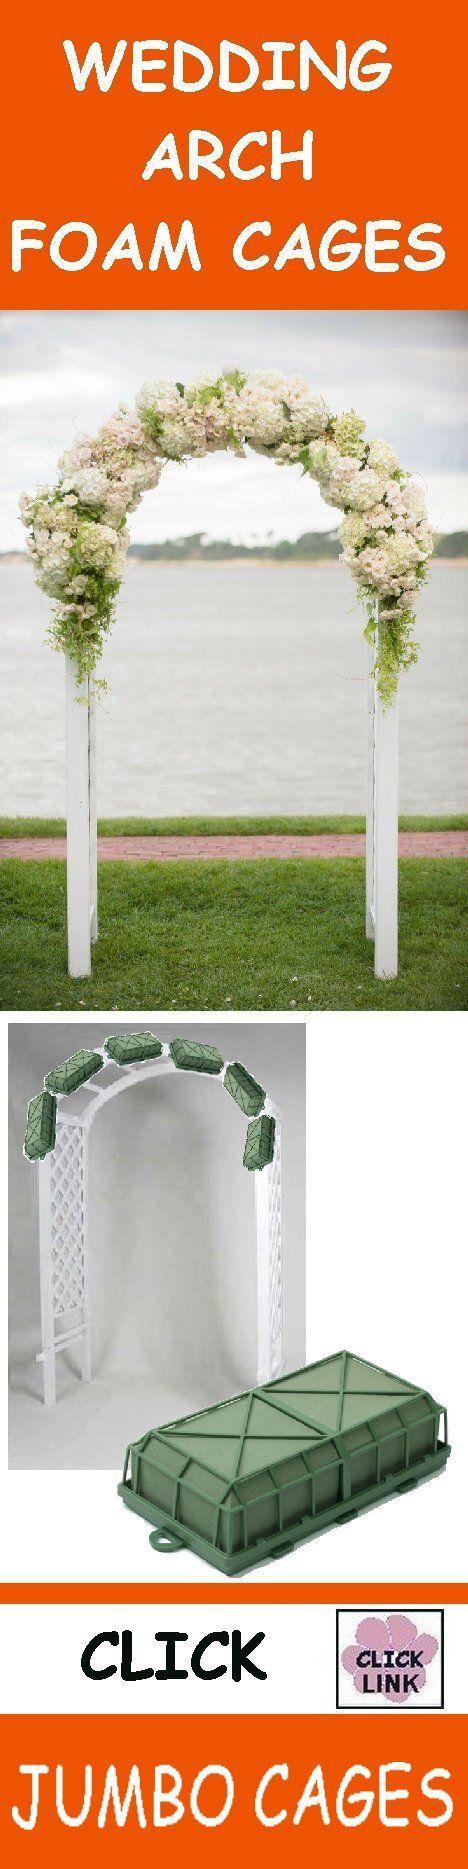 best granfesta images on pinterest weddings bridal bouquets